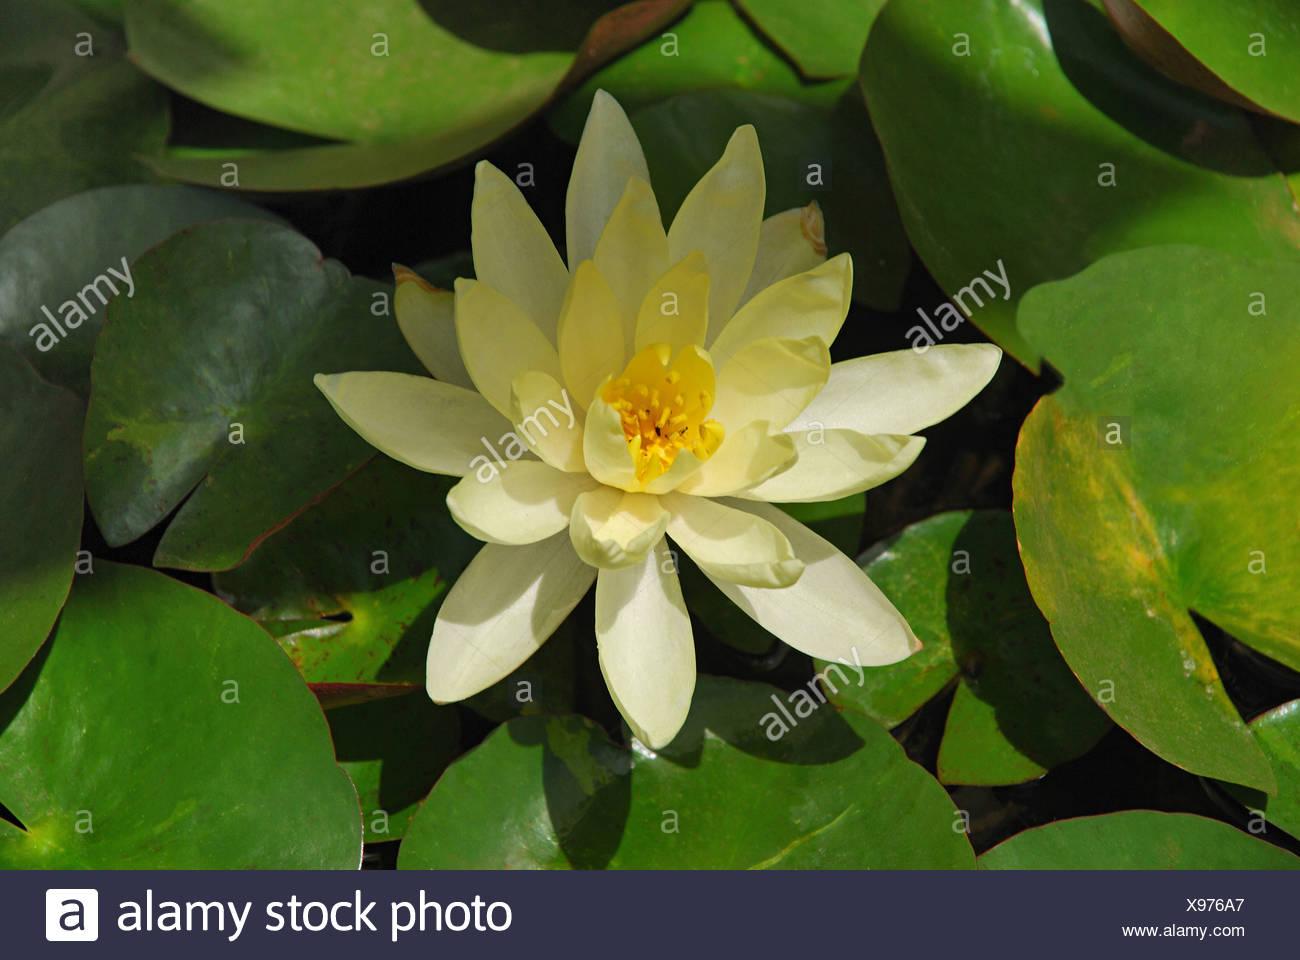 Yellow Lotus Or Nelumbo Lutea Lotus Flower Is The National Flower